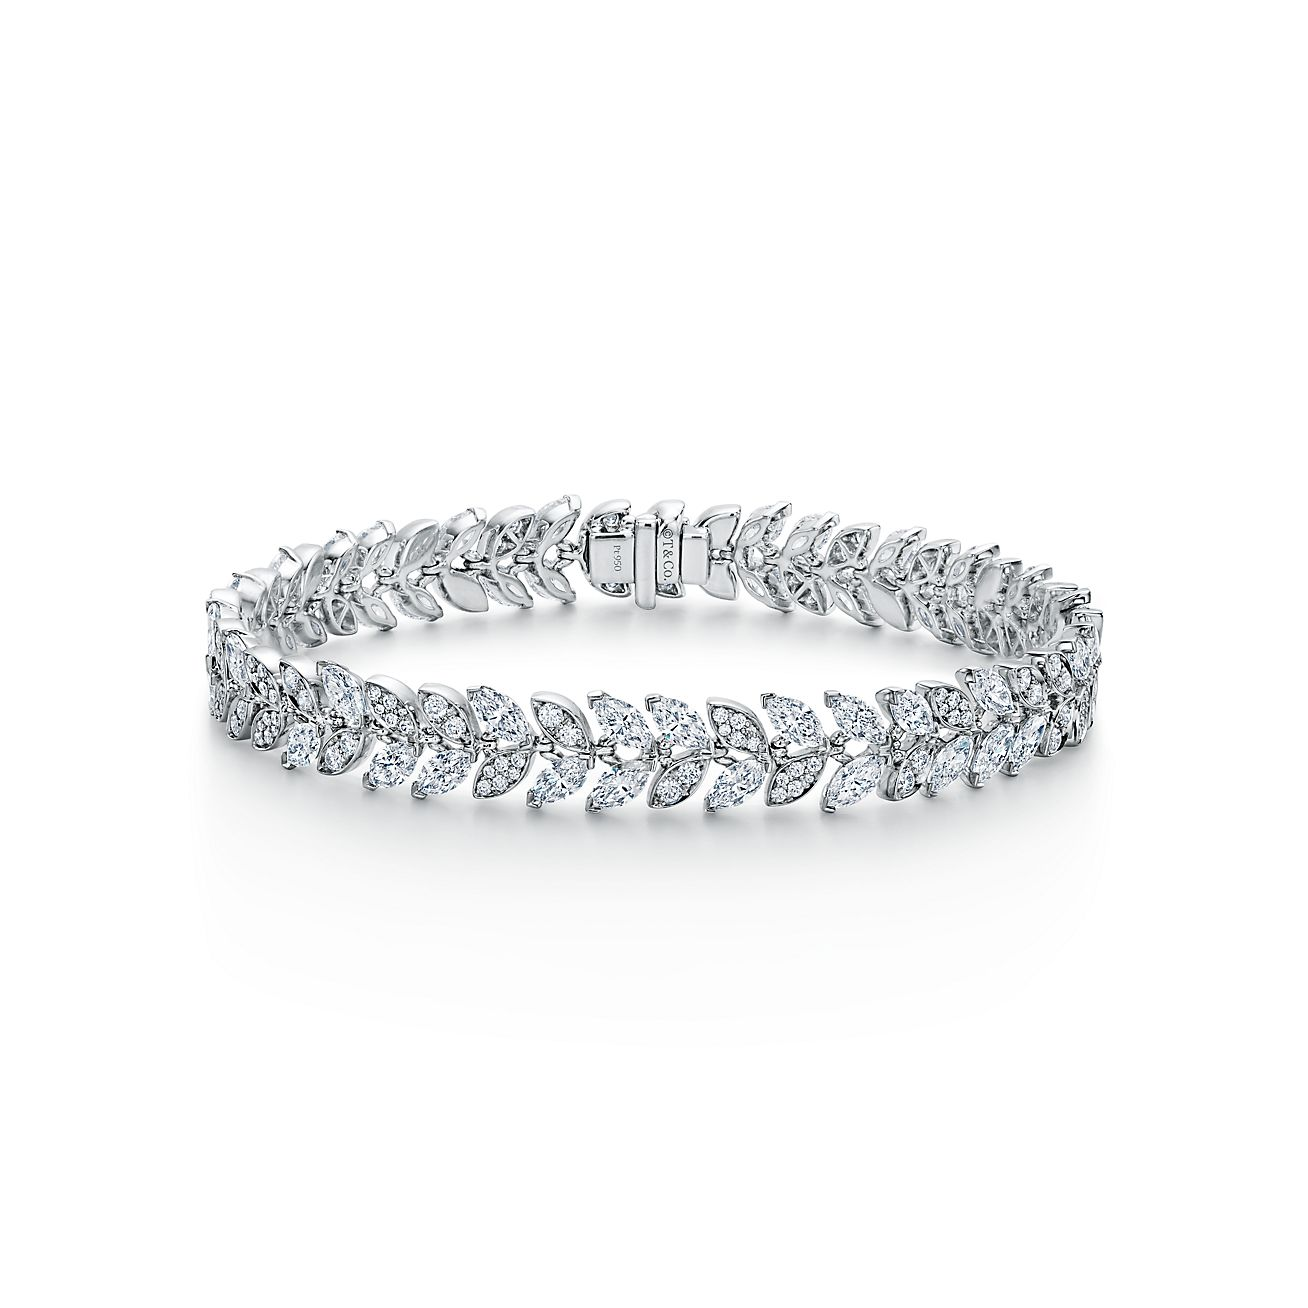 Tiffany Victoria Vine Tennis Bracelet In Platinum With Diamonds Tiffany Co